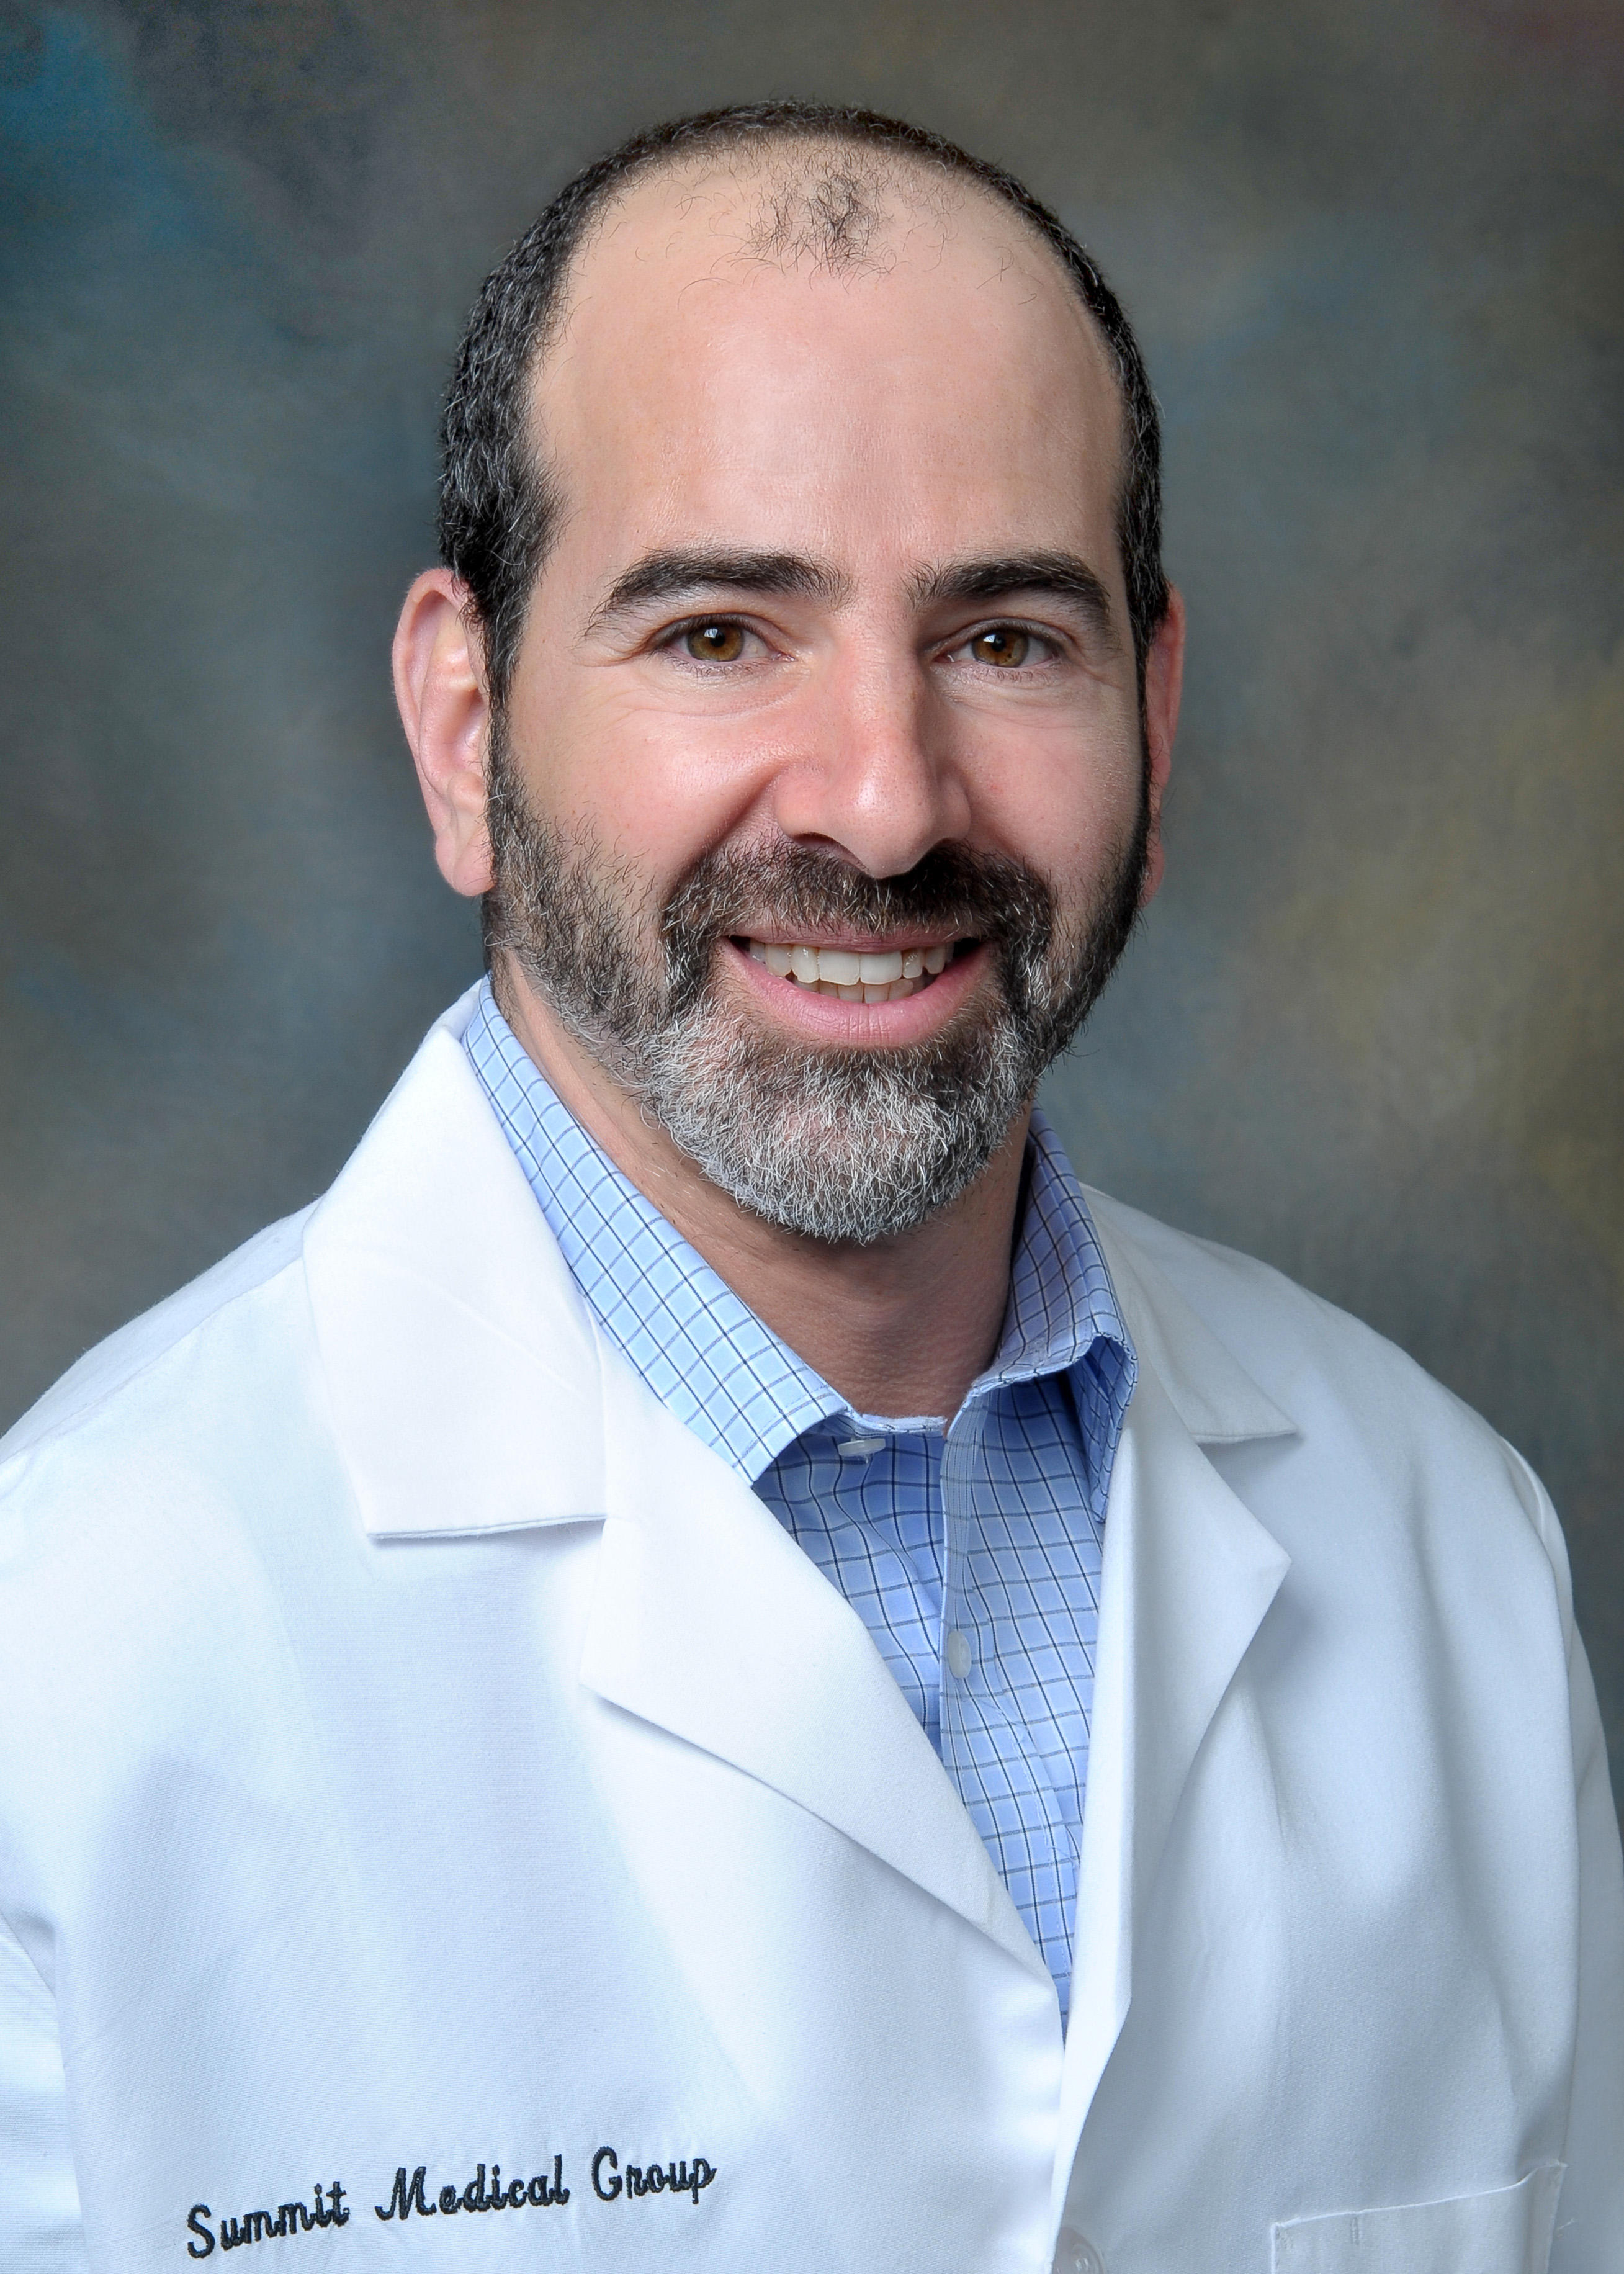 Scott Hanan, MD